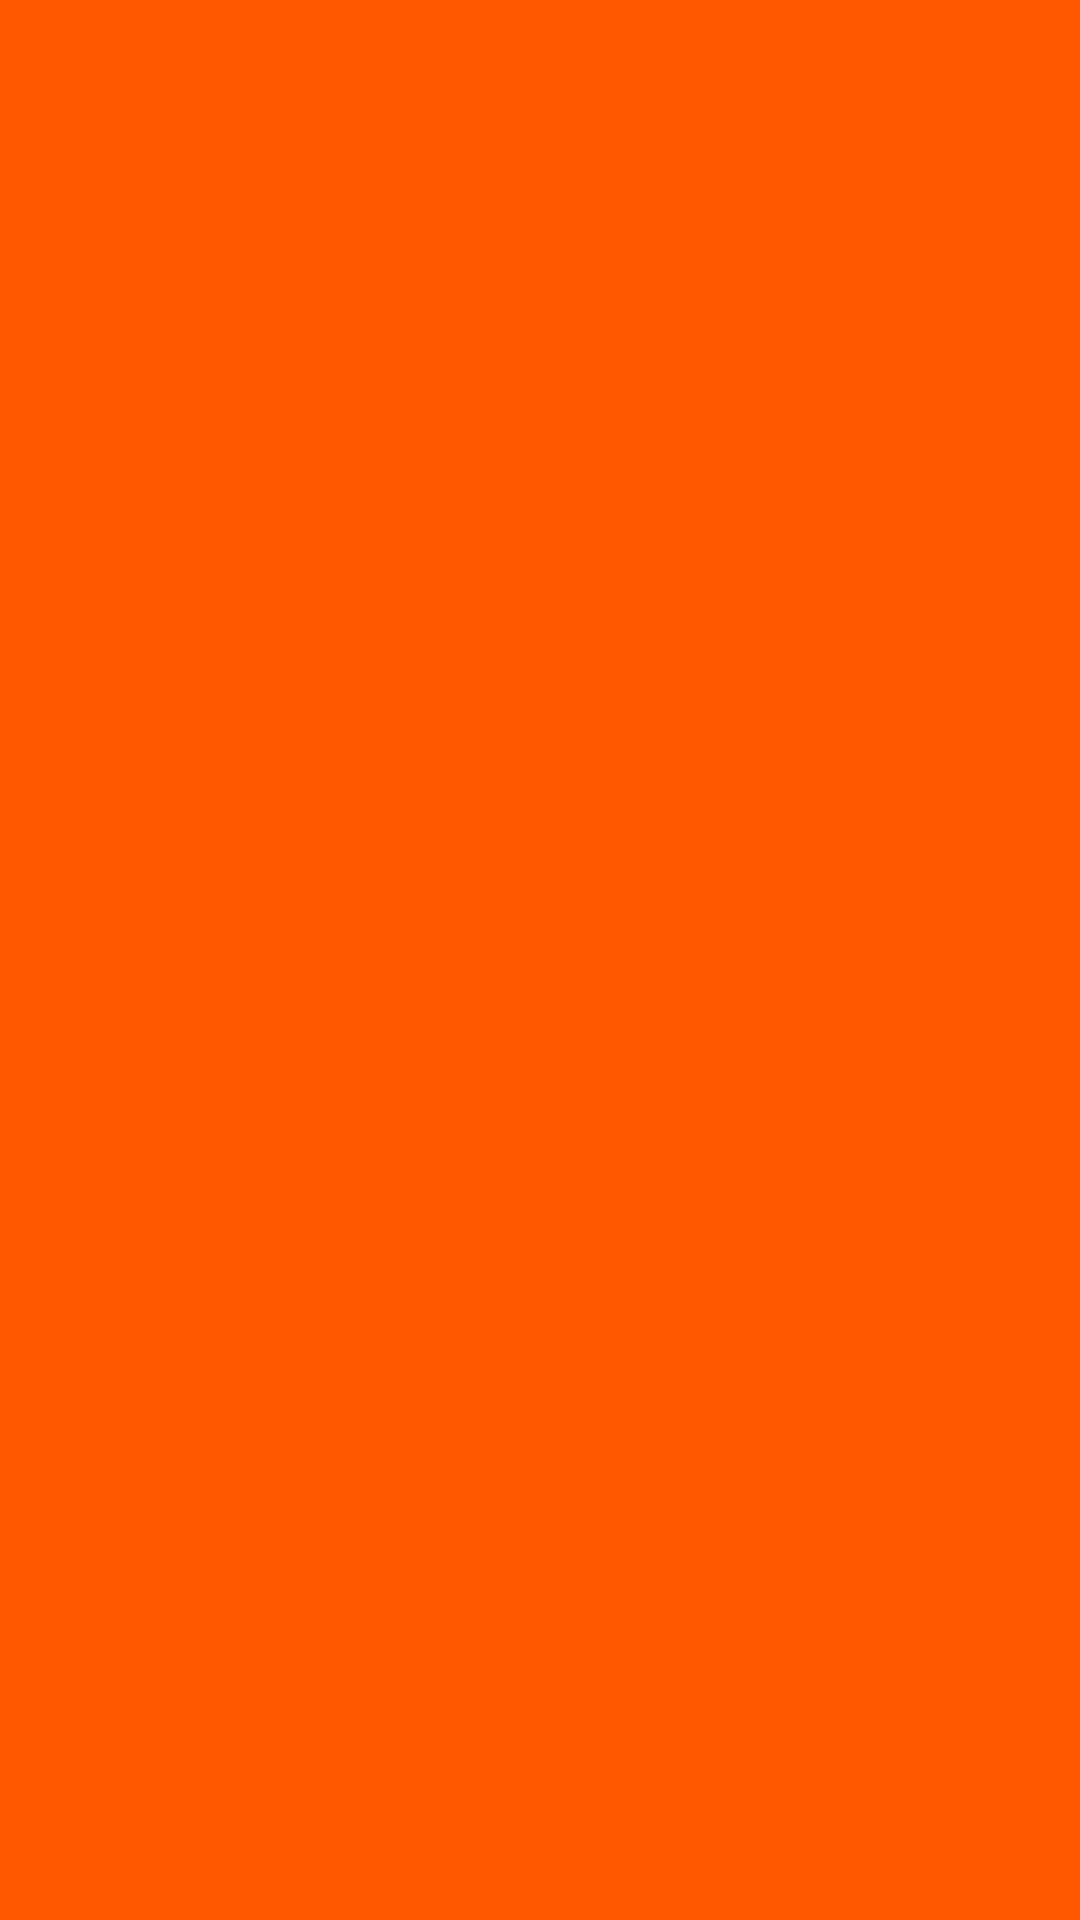 1080x1920 Orange Pantone Solid Color Background